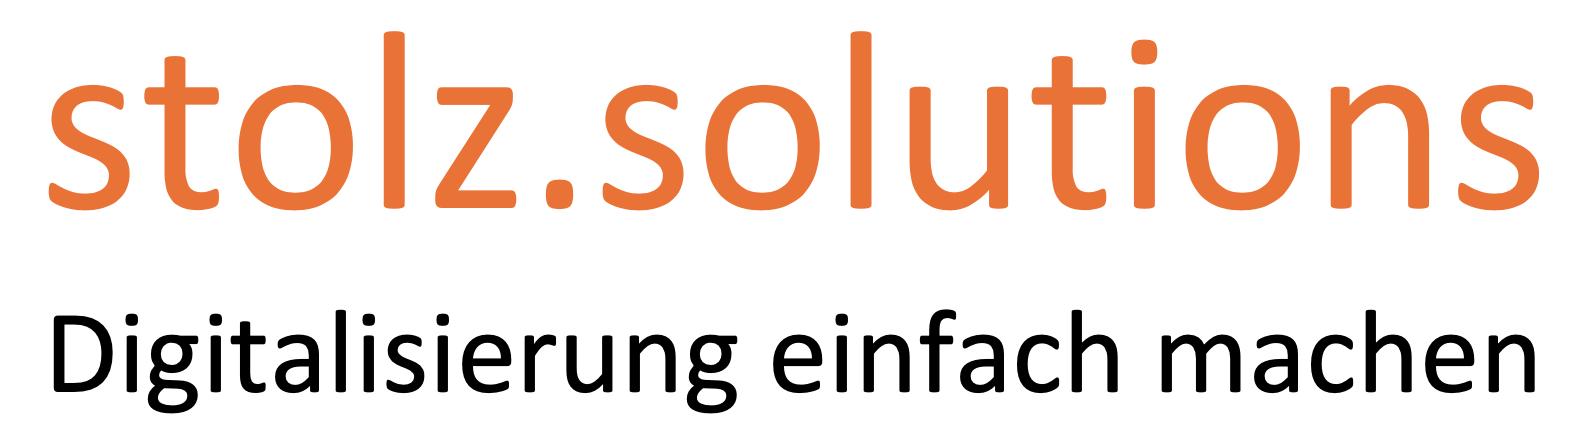 stolz-solutions-logo